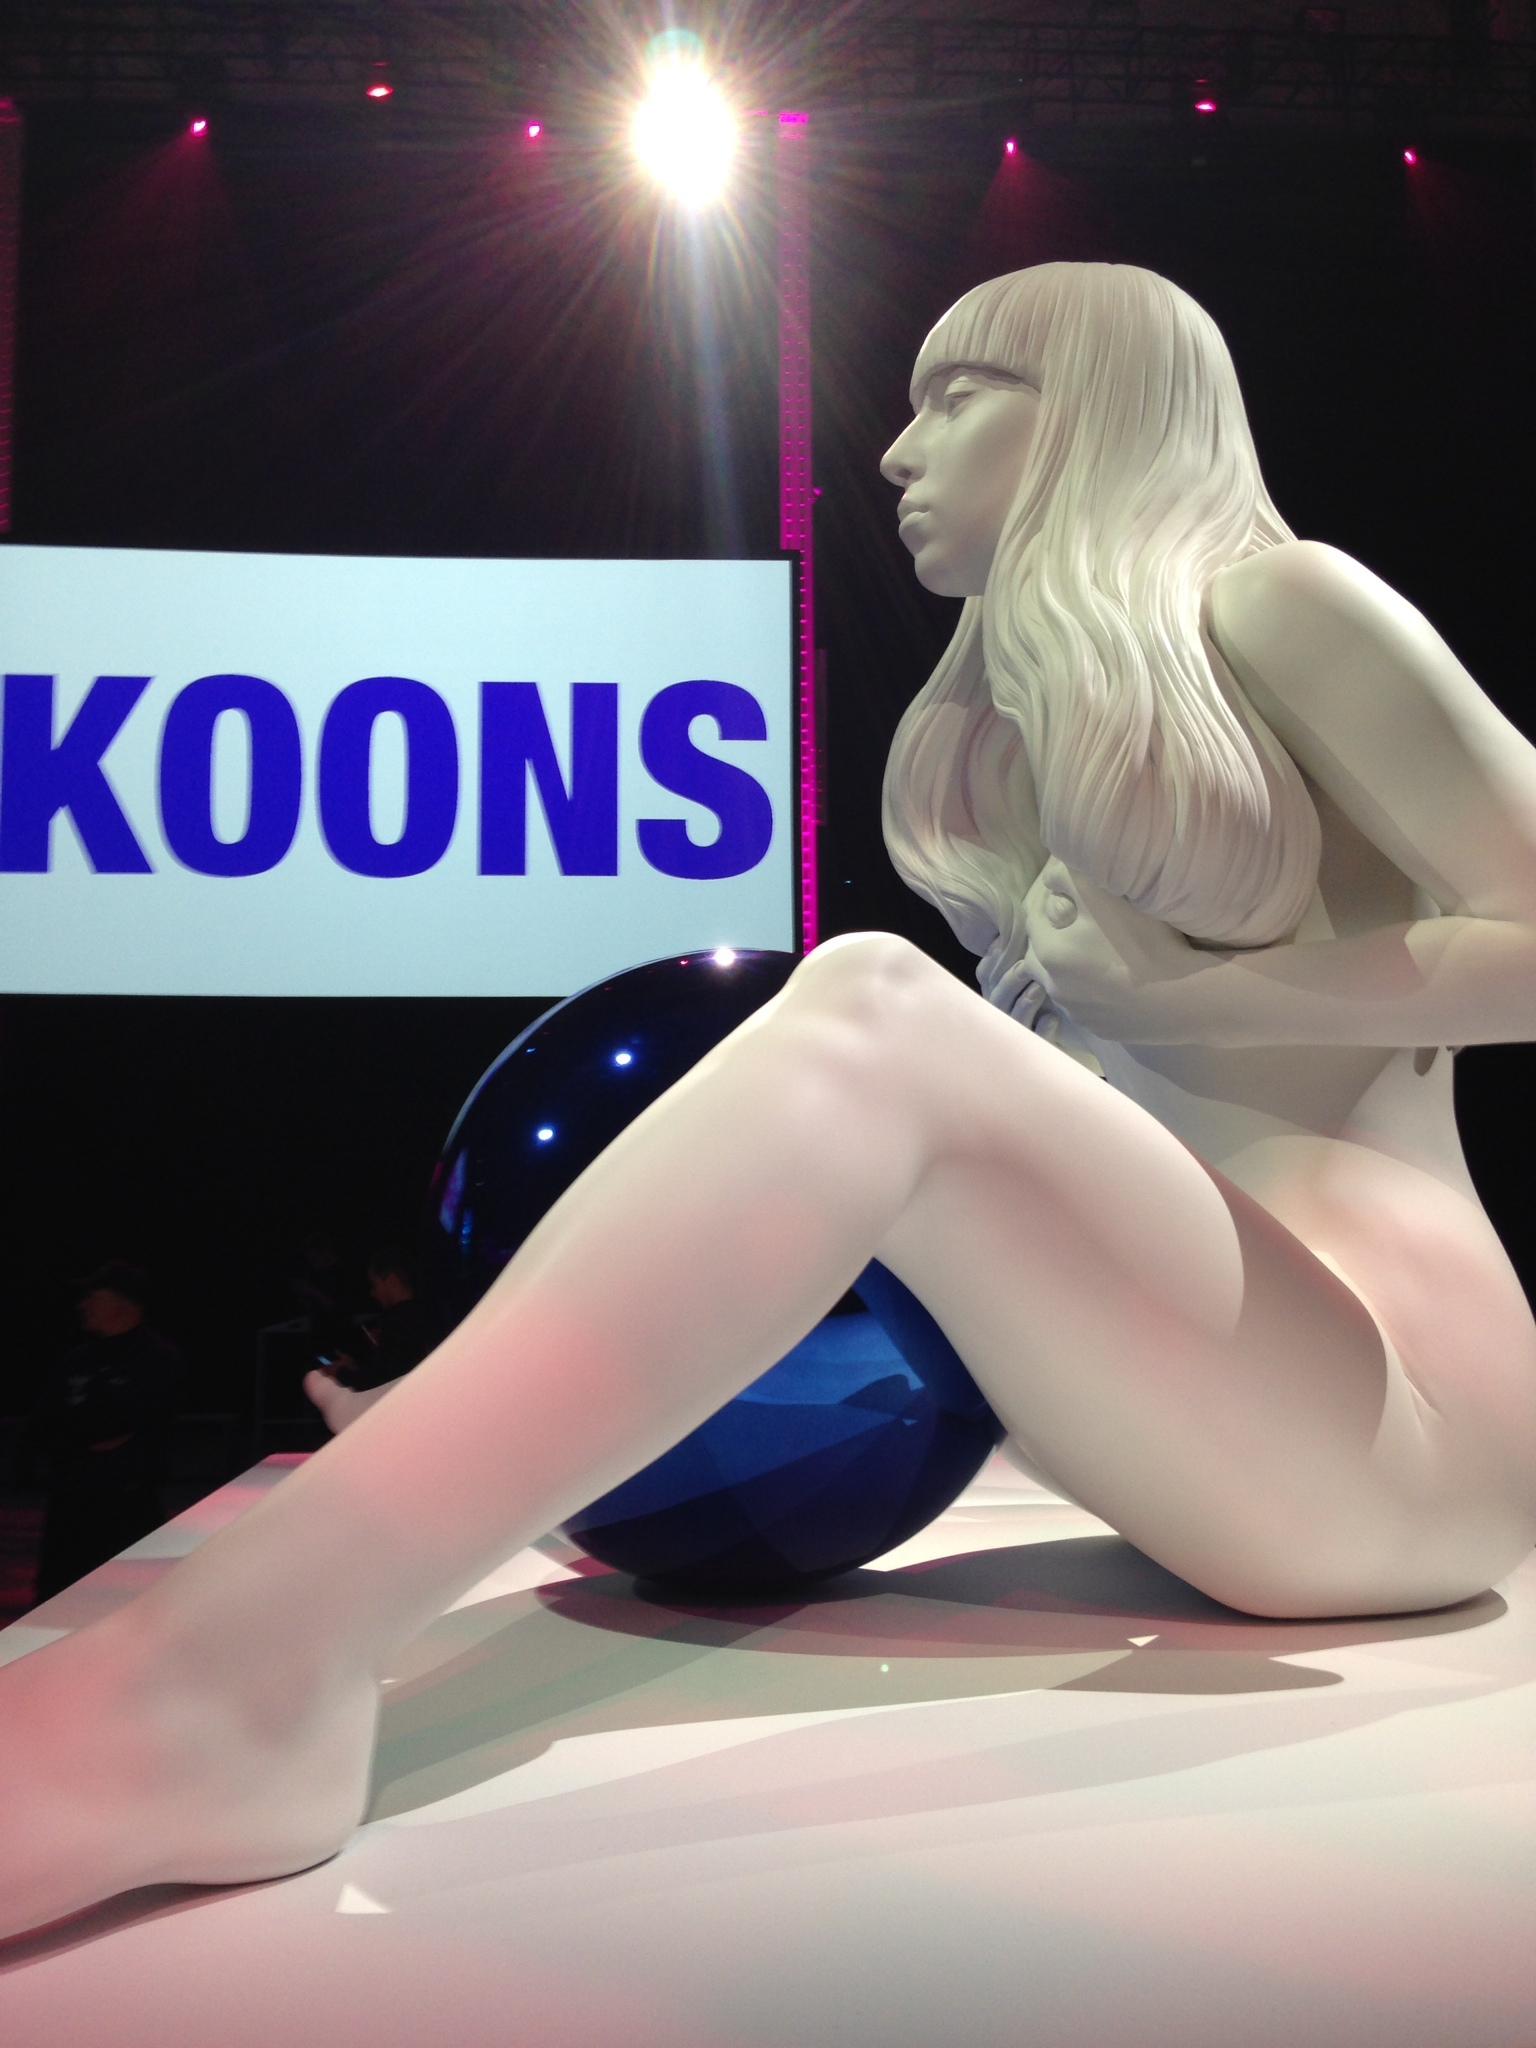 Maria_Brito_Lady-Gaga-Koons-ArtRave-10.jpg